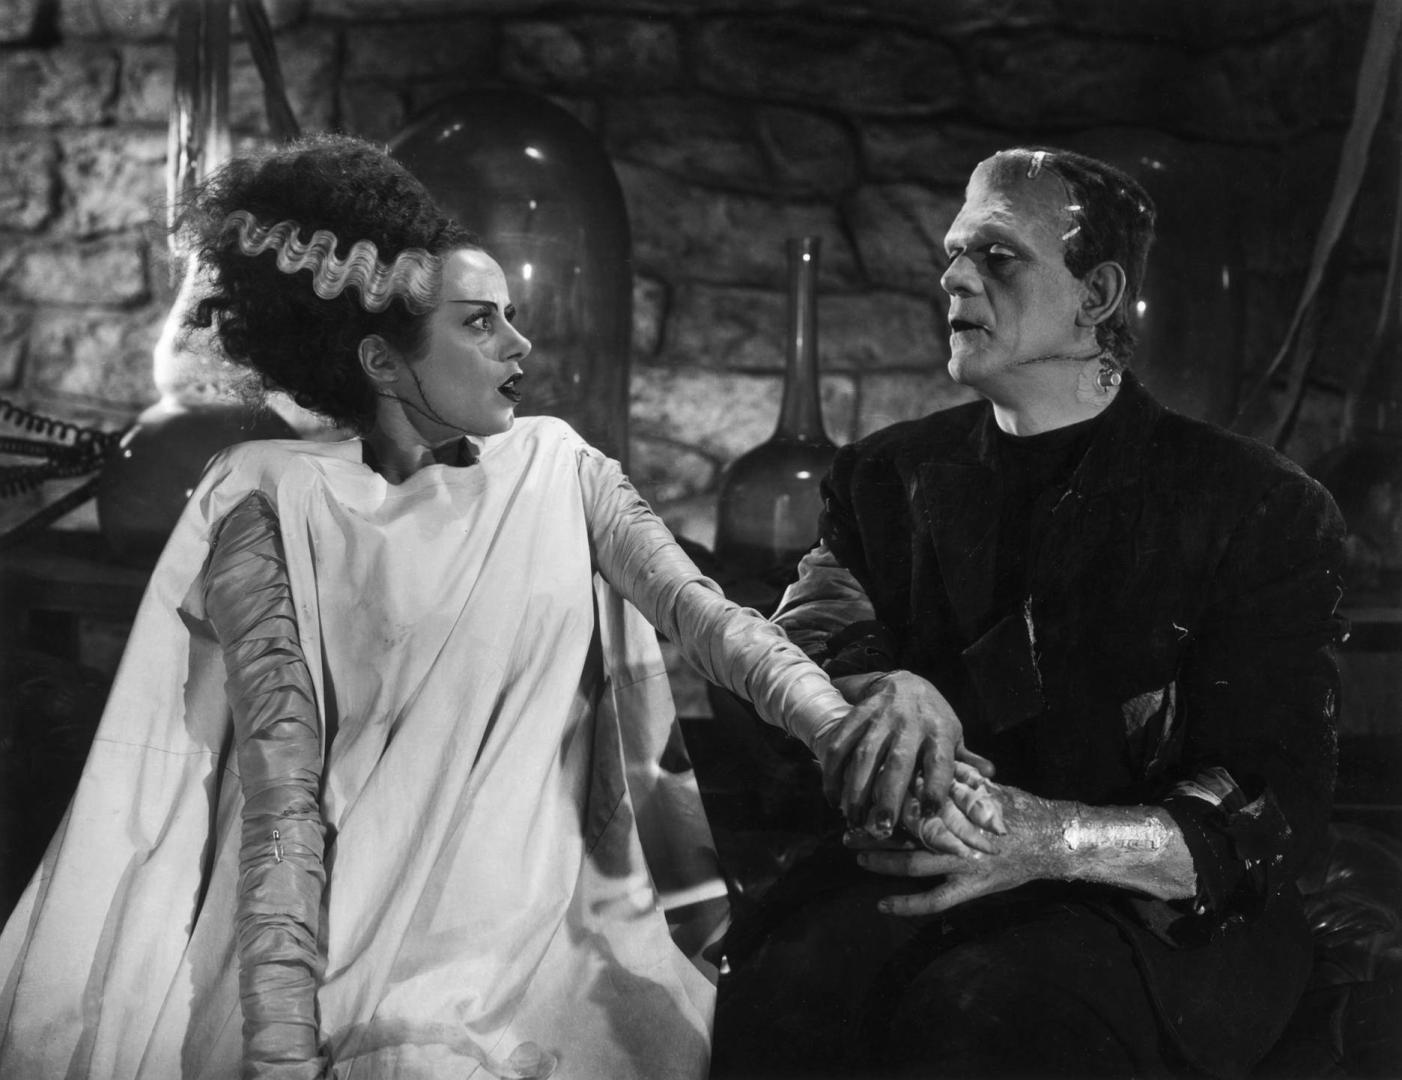 Bride of Frankenstein - Frankenstein menyasszonya (1935) 1. kép